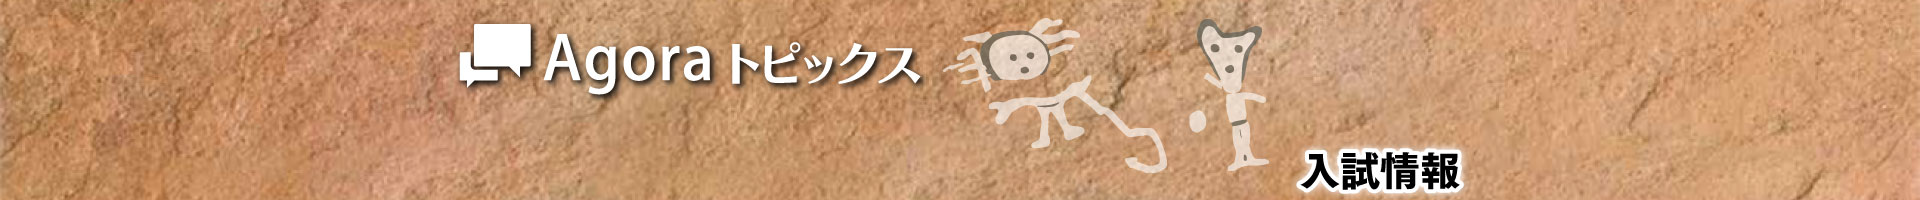 Agoraトピックス:入試情報